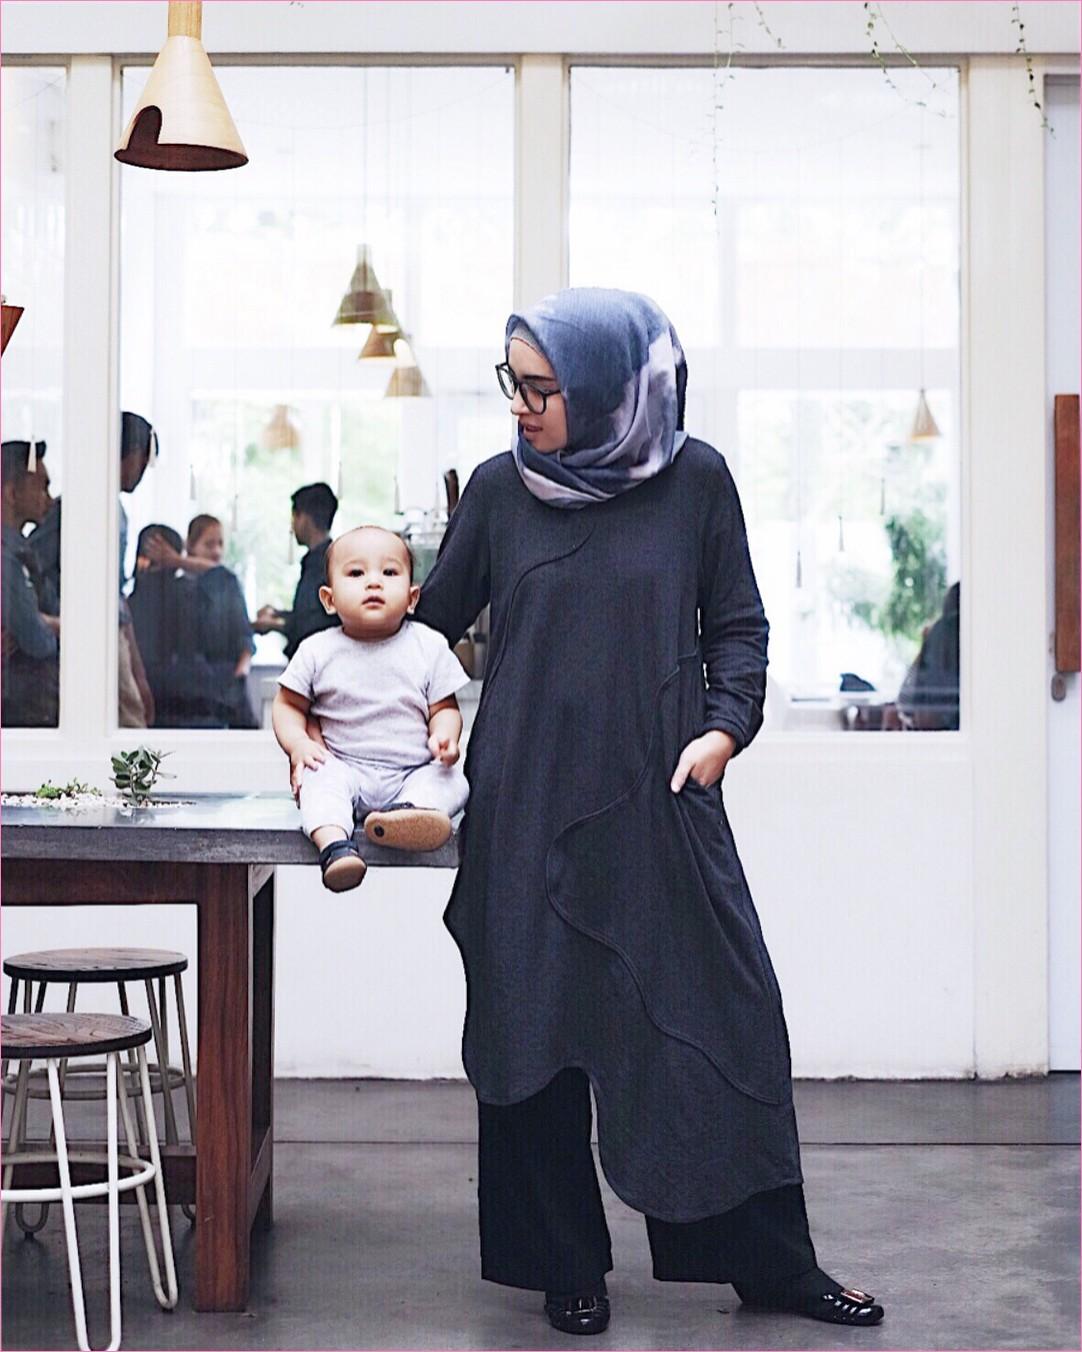 Outfit Baju Tunic Untuk Hijabers Ala Selebgram 2018 baju tunic biru dongker celana kulot hitam kerudung segiempat hijab square abu tua ciput rajut kacamata bulat flatshoes ootd trendy kekinian cafe meja kursi kayu lampu